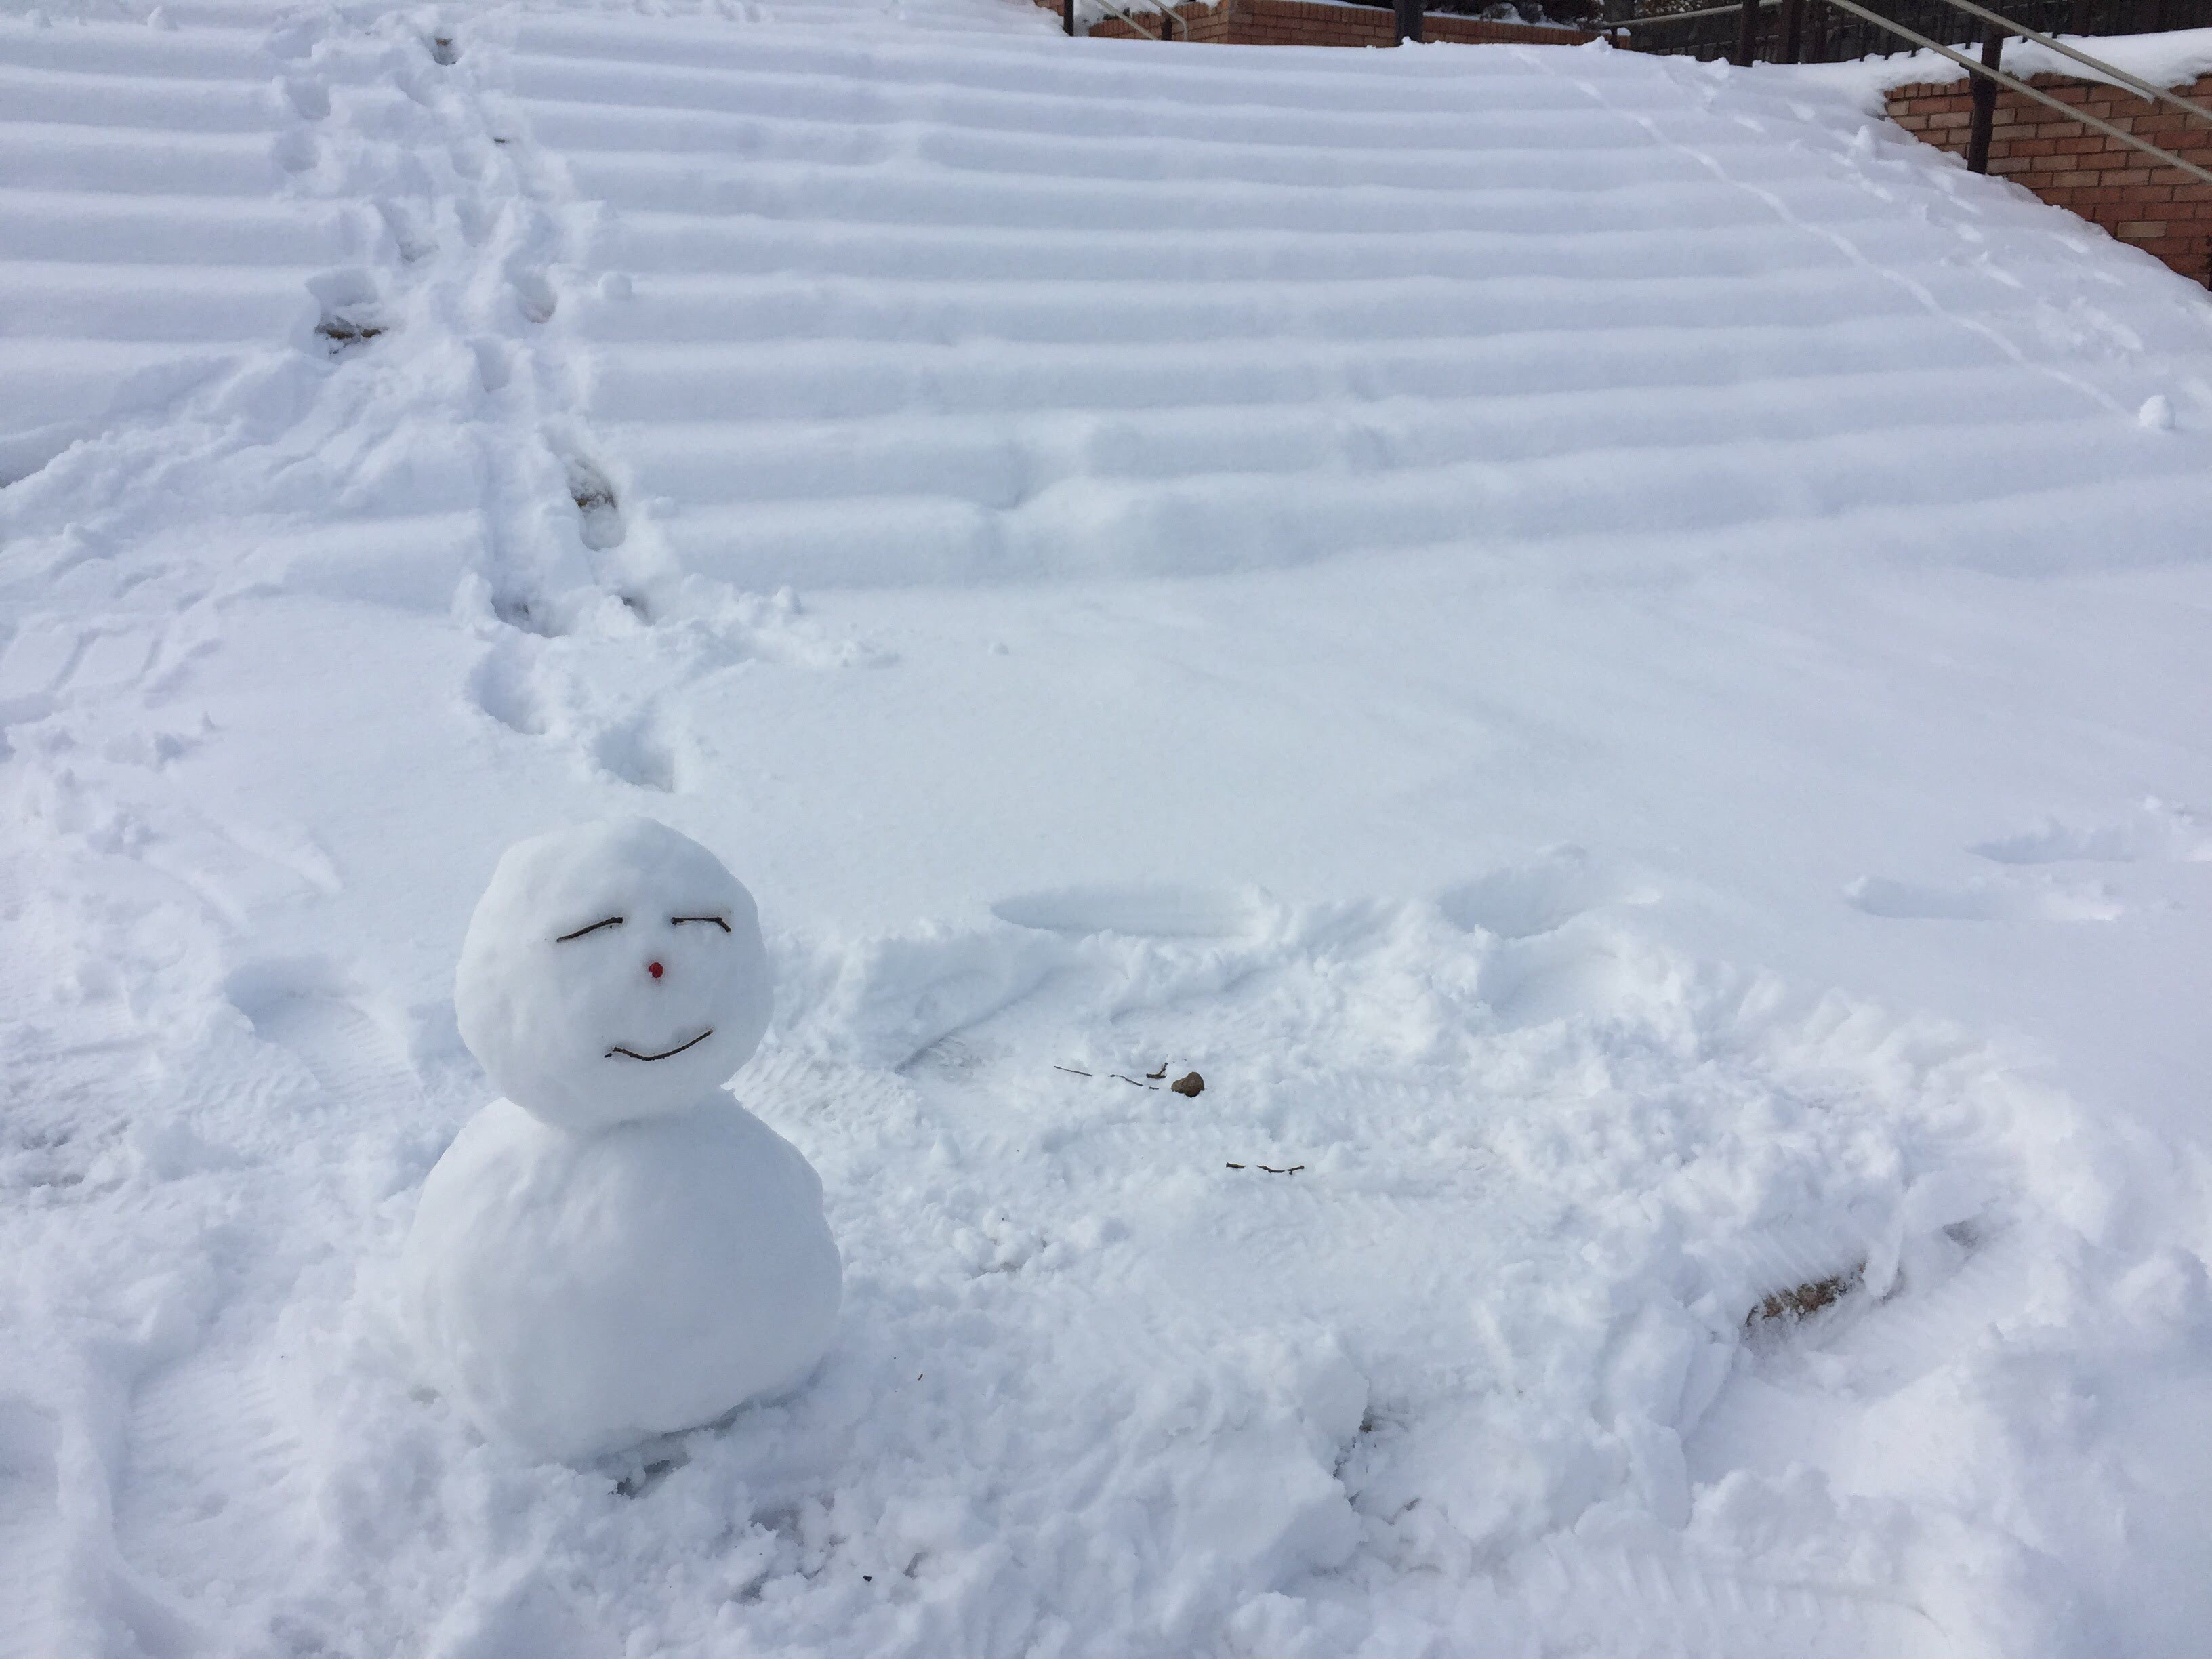 明日は雪予報!?